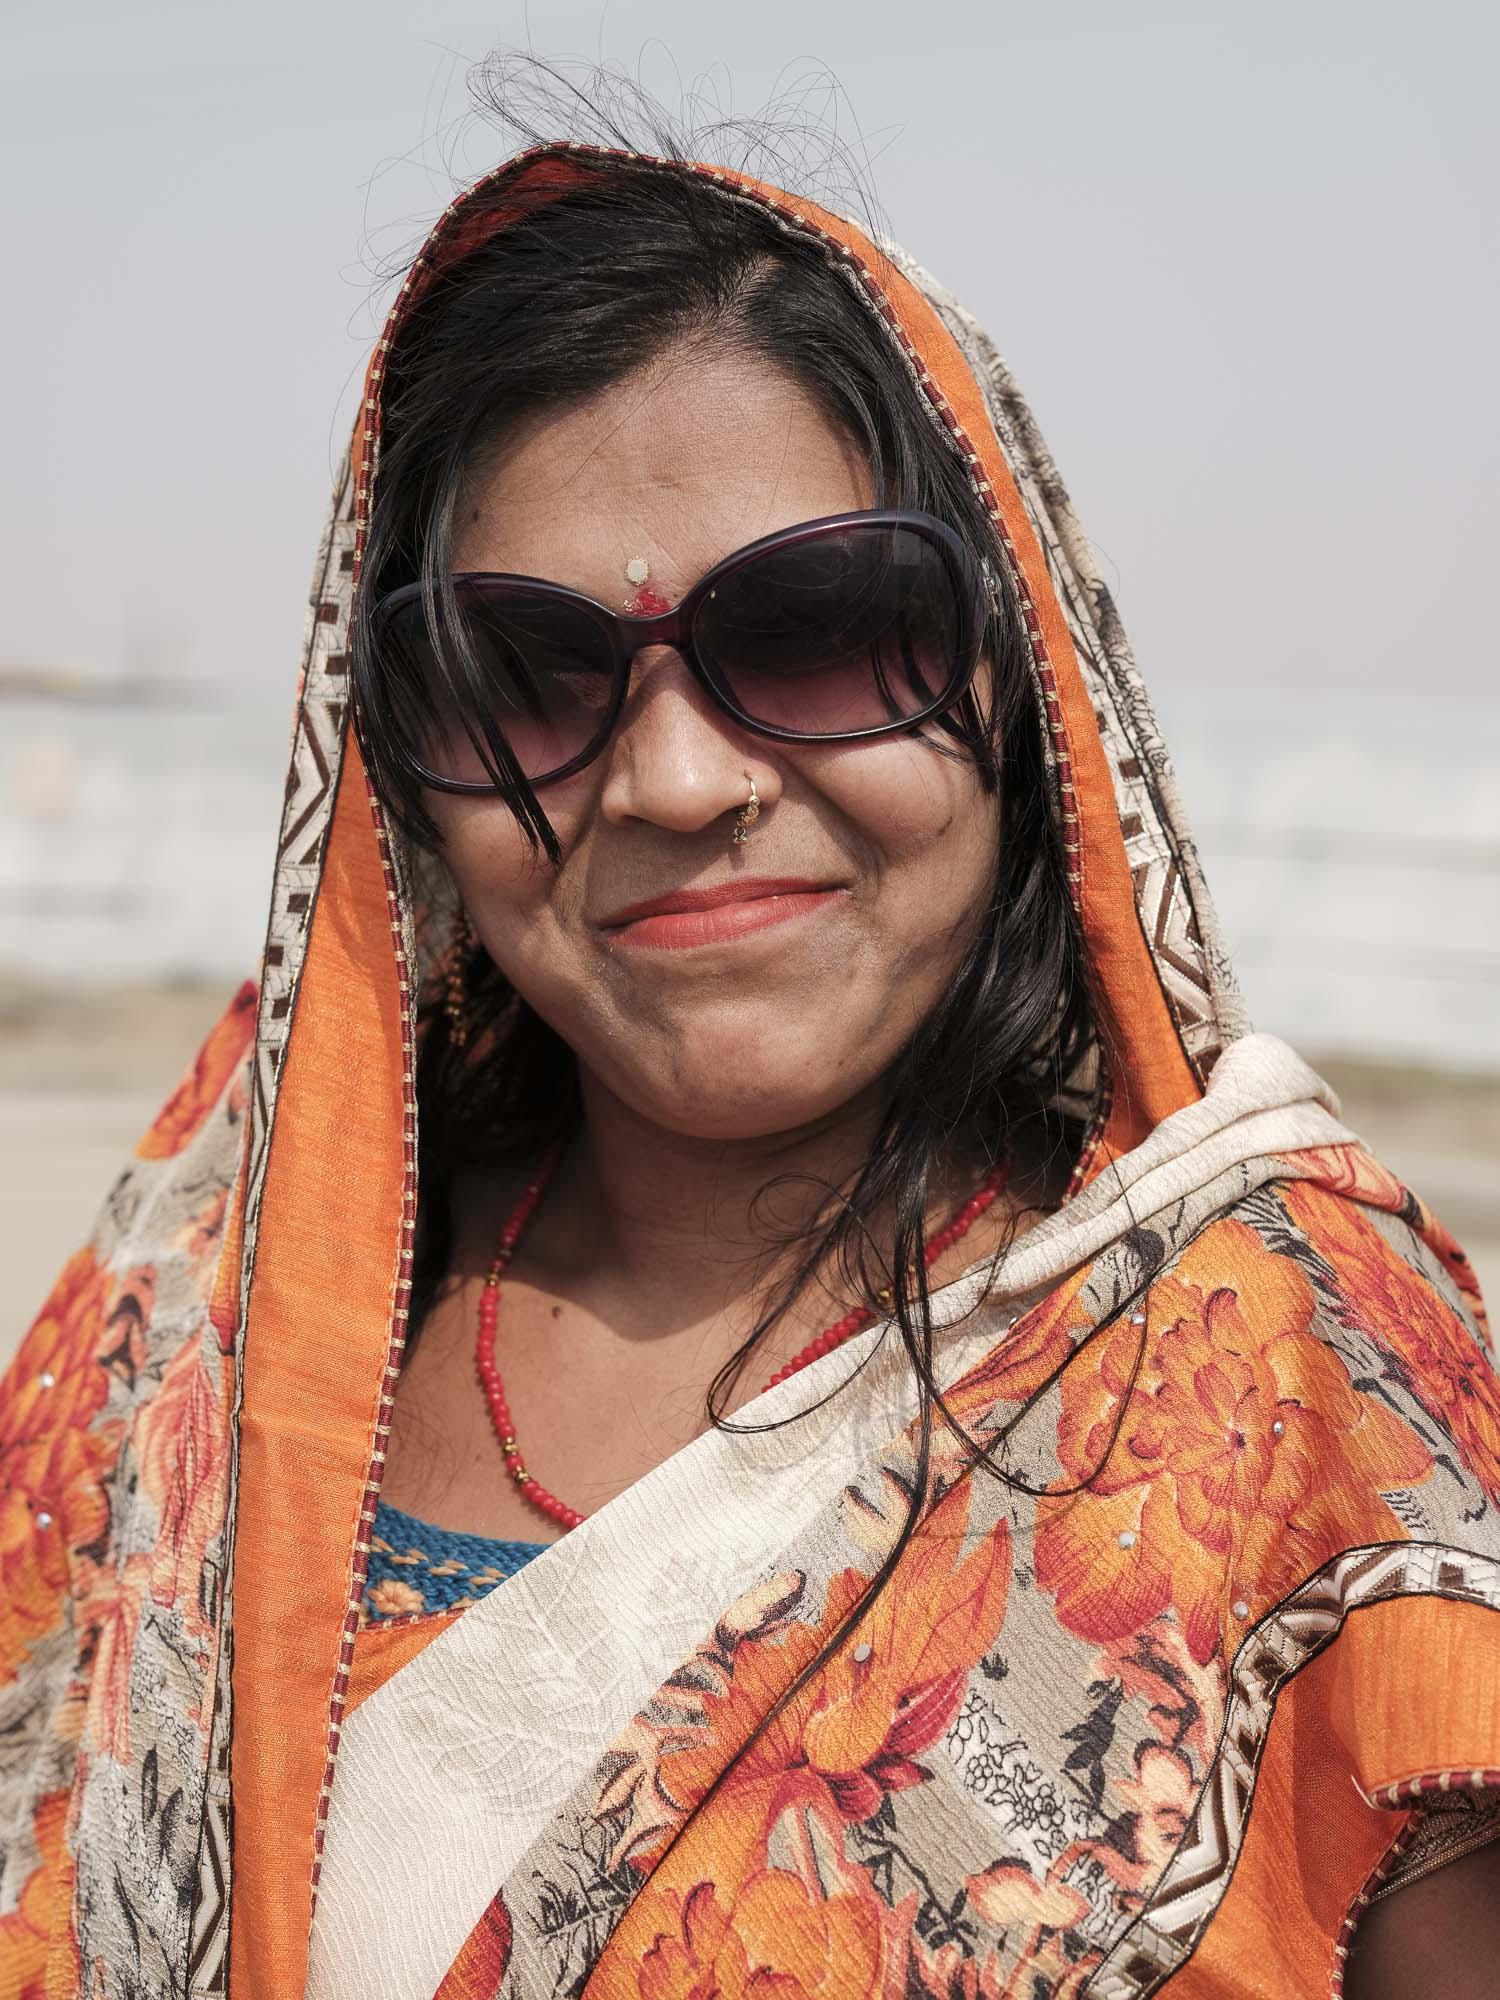 lady portrait sari pilgrims Kumbh mela 2019 India Allahabad Prayagraj Ardh hindu religious Festival event rivers photographer jose jeuland photography